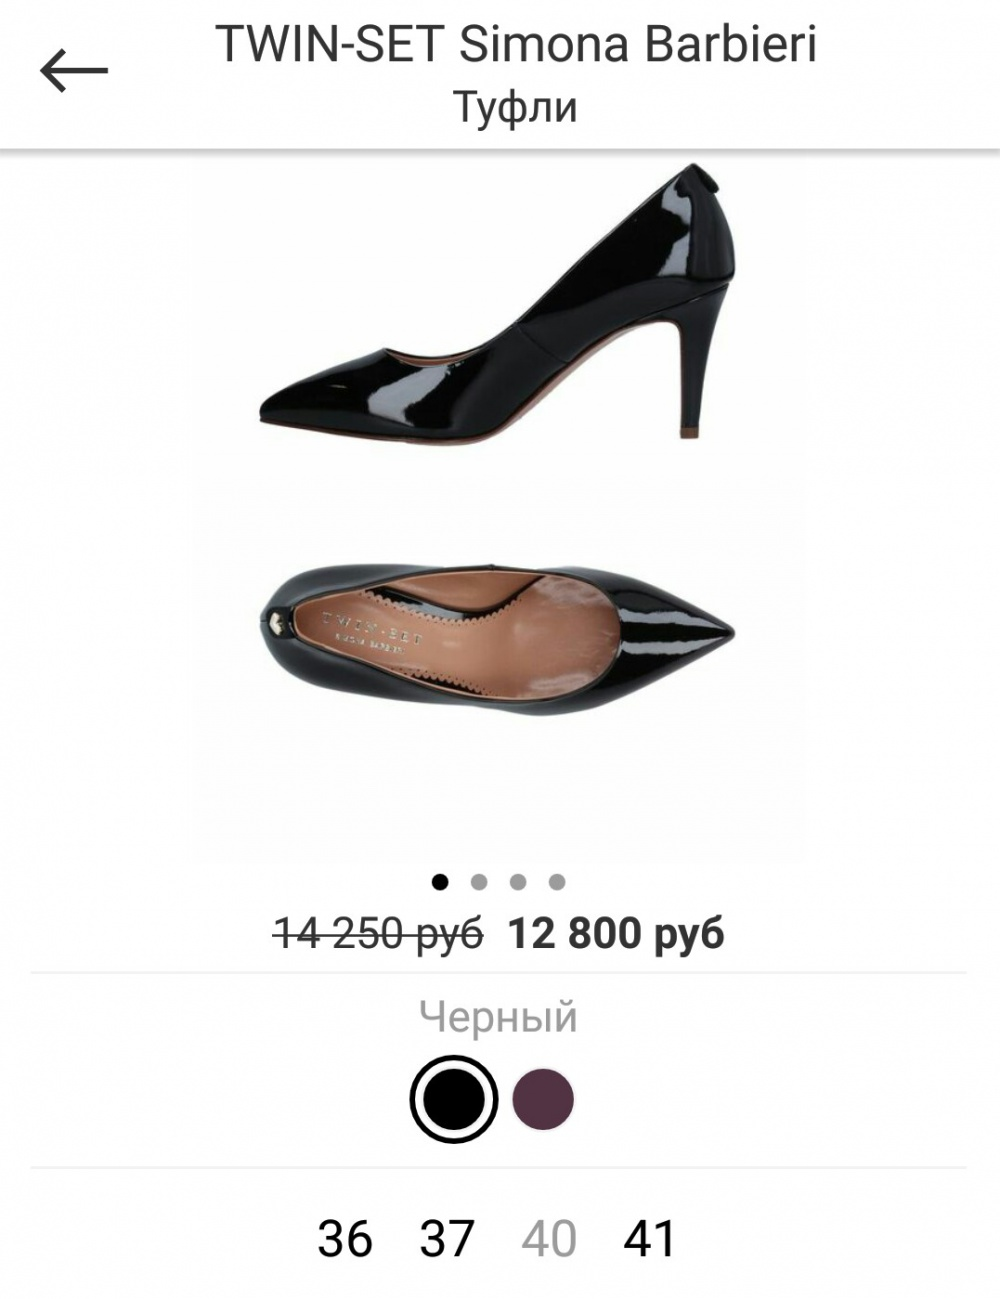 Туфли Twin-Set Simona Barbieri, размер 38